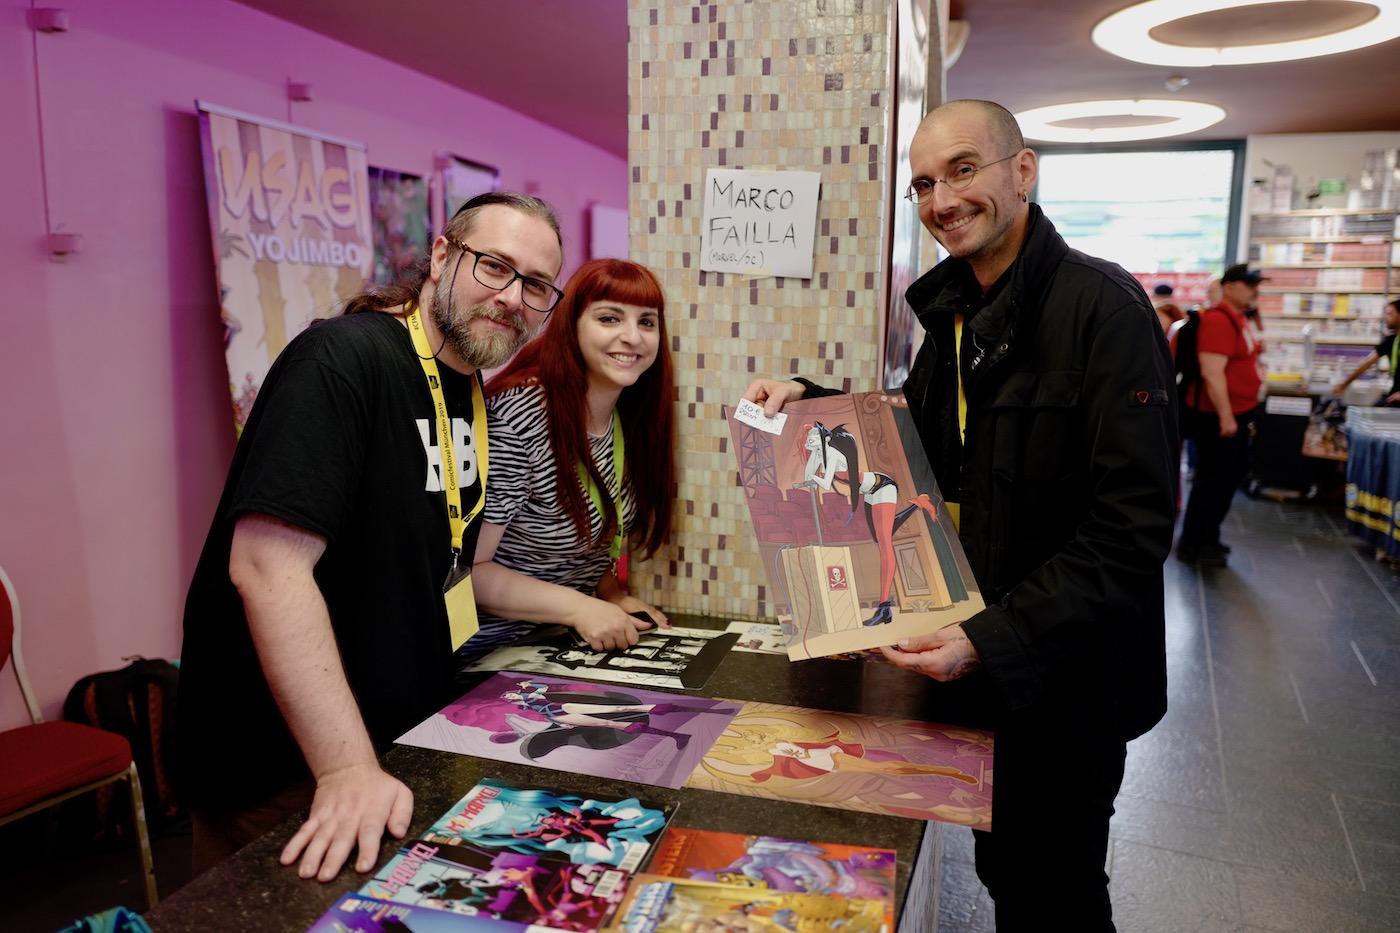 mark_benecke_comic_festival_muenchen_munich_comic_con_2019 - 9.jpg